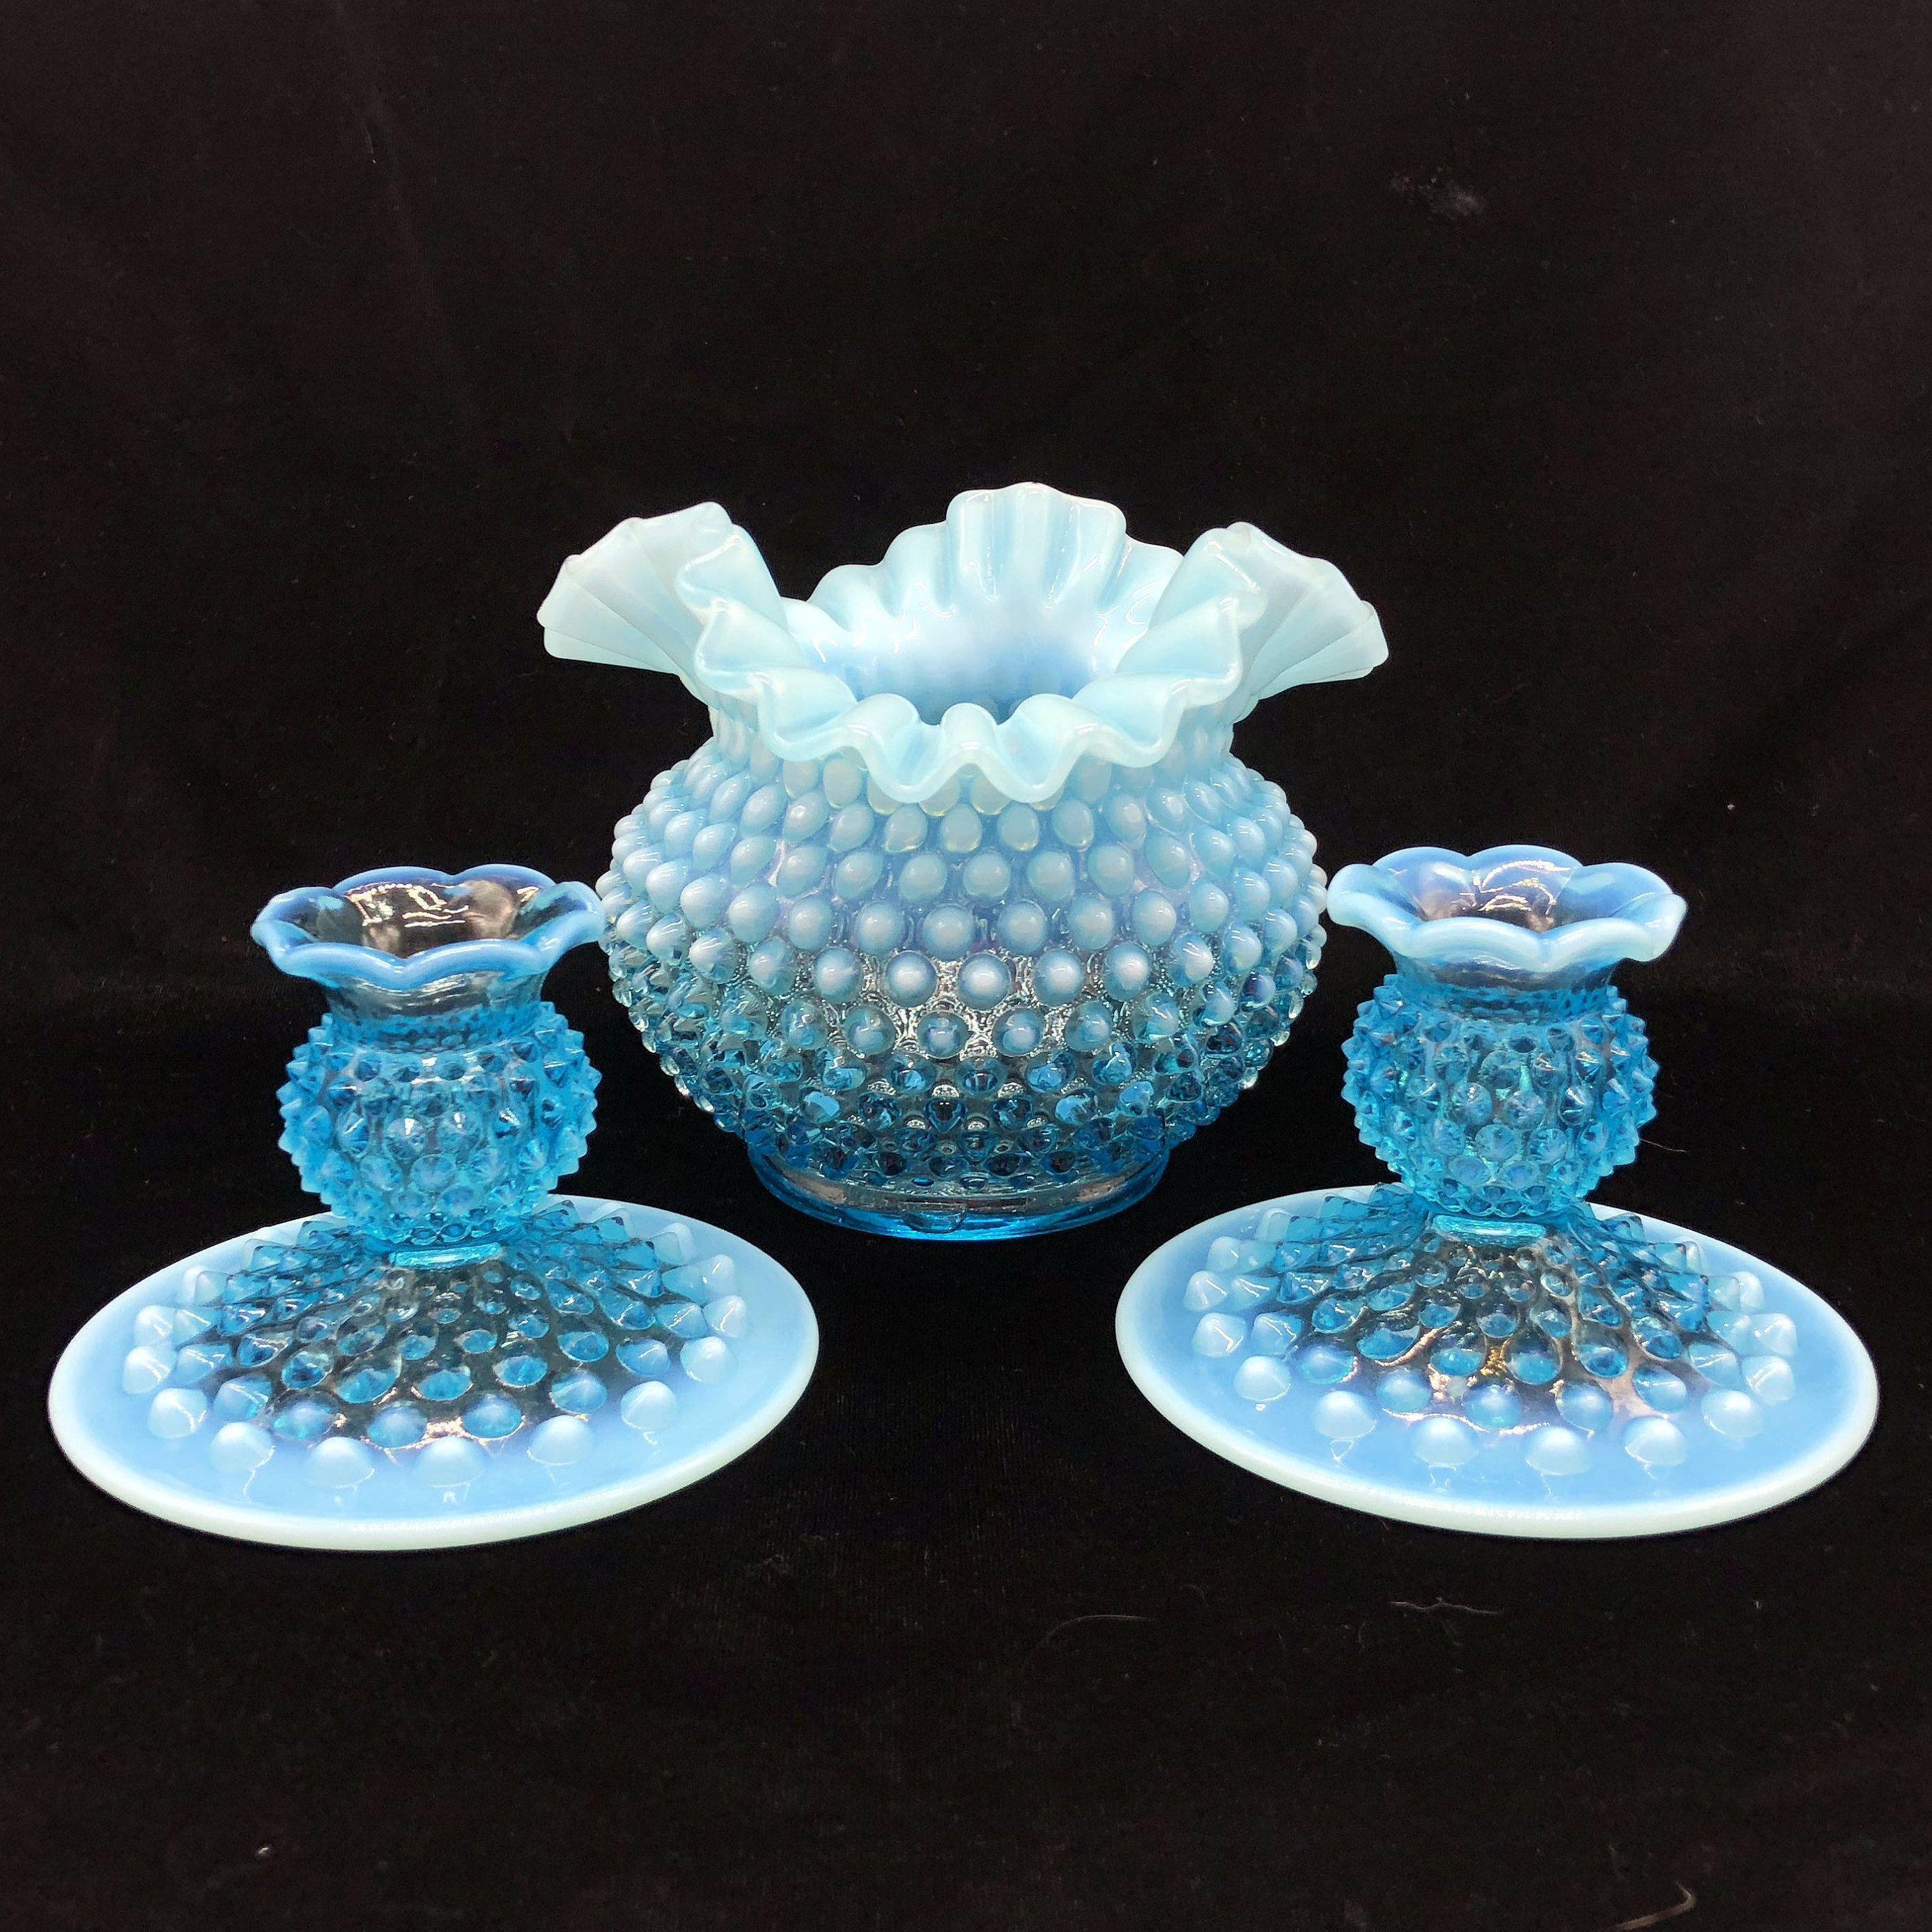 steuben aurene vase of 37 fenton blue glass vase the weekly world inside fenton hobnail glass centerpiece set blue opalescent vase candle